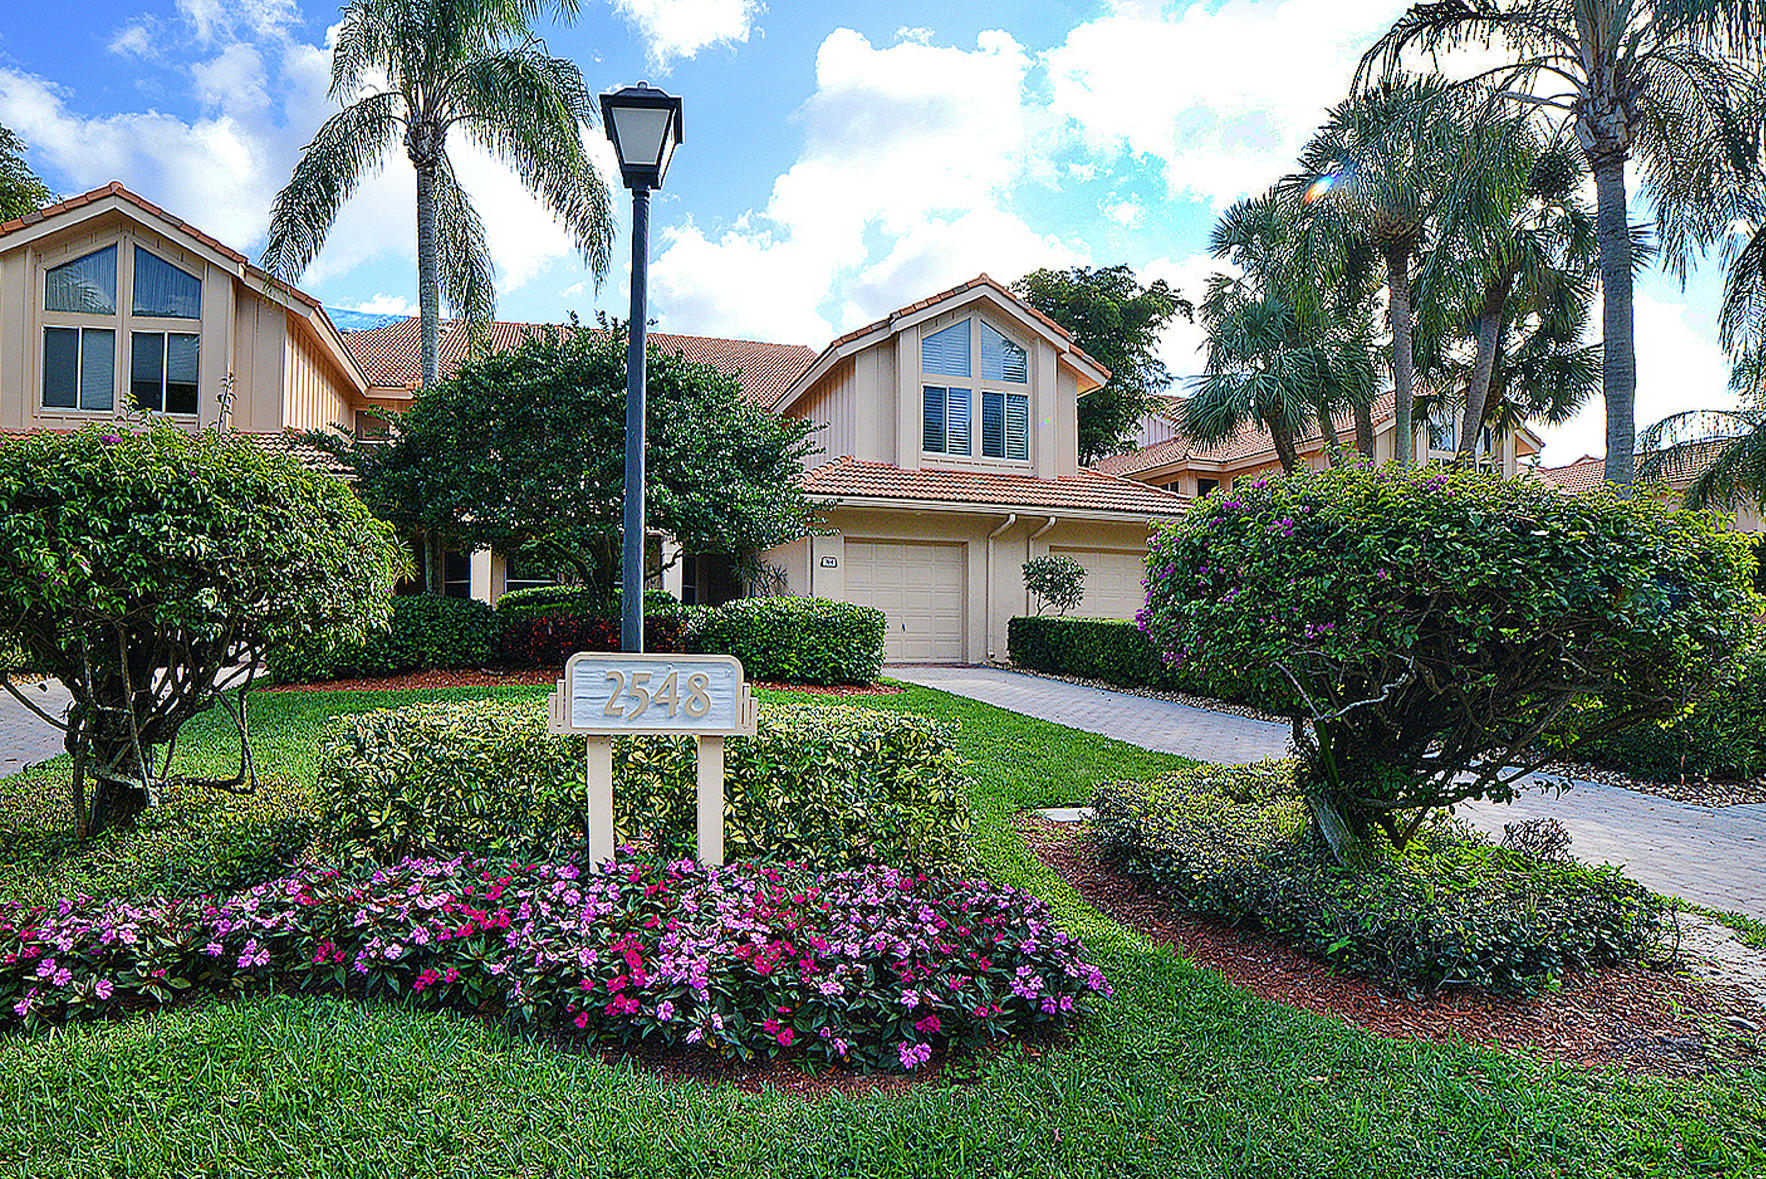 2548 Coco Plum Boulevard #704 Boca Raton, FL 33496